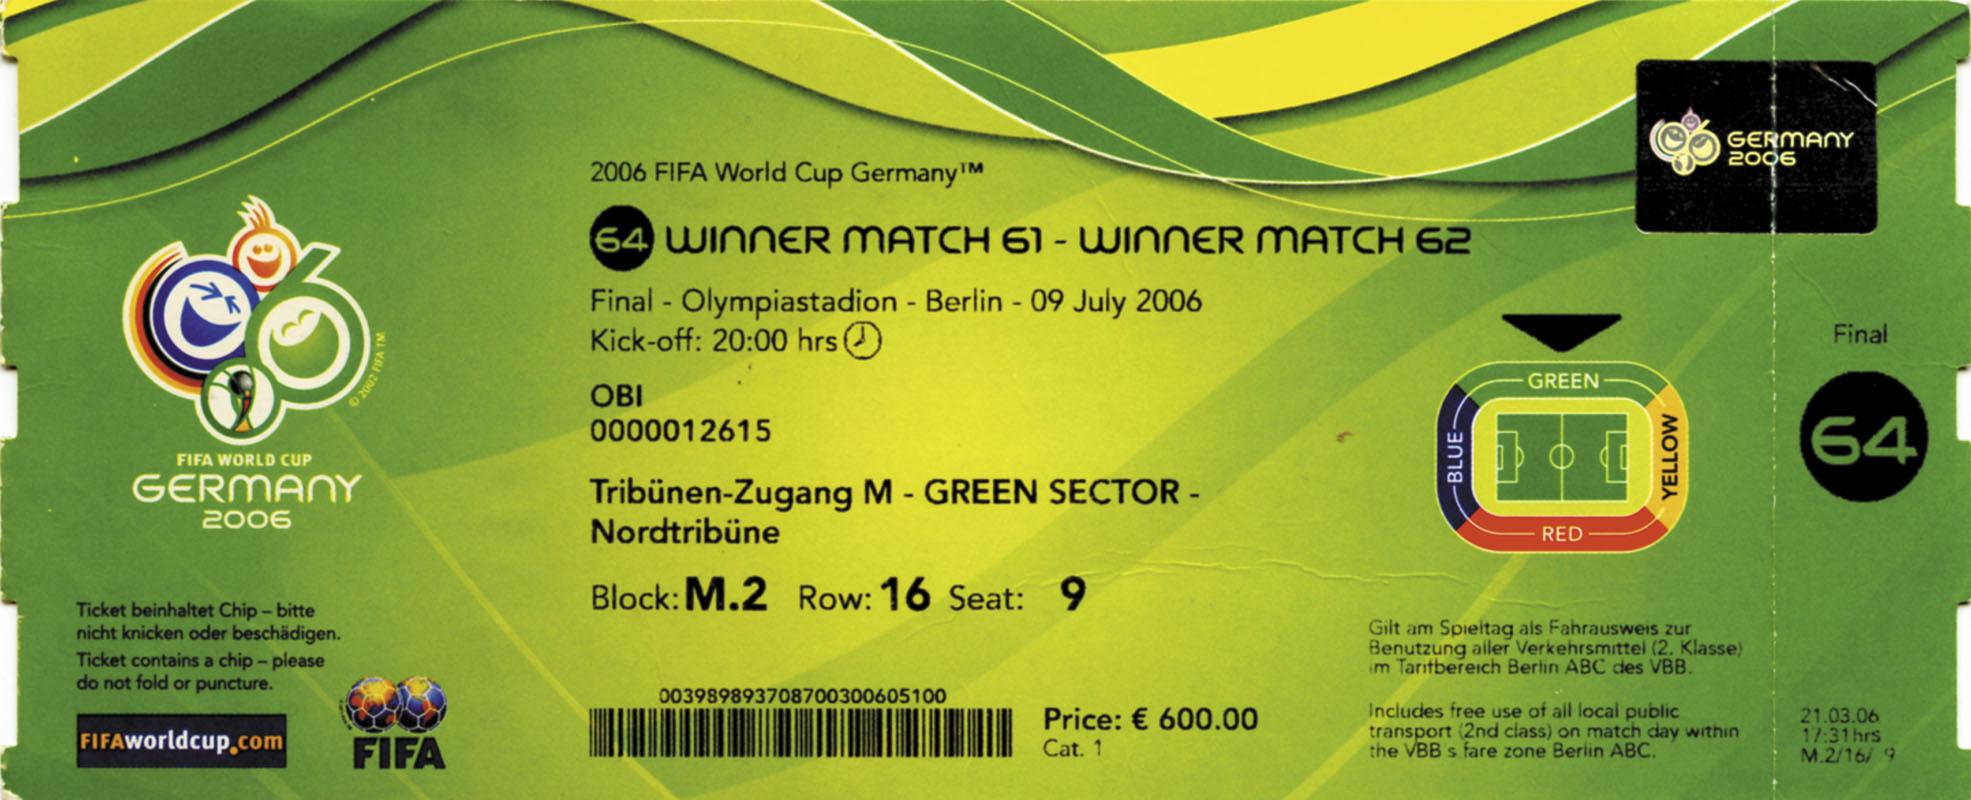 Germania 2006